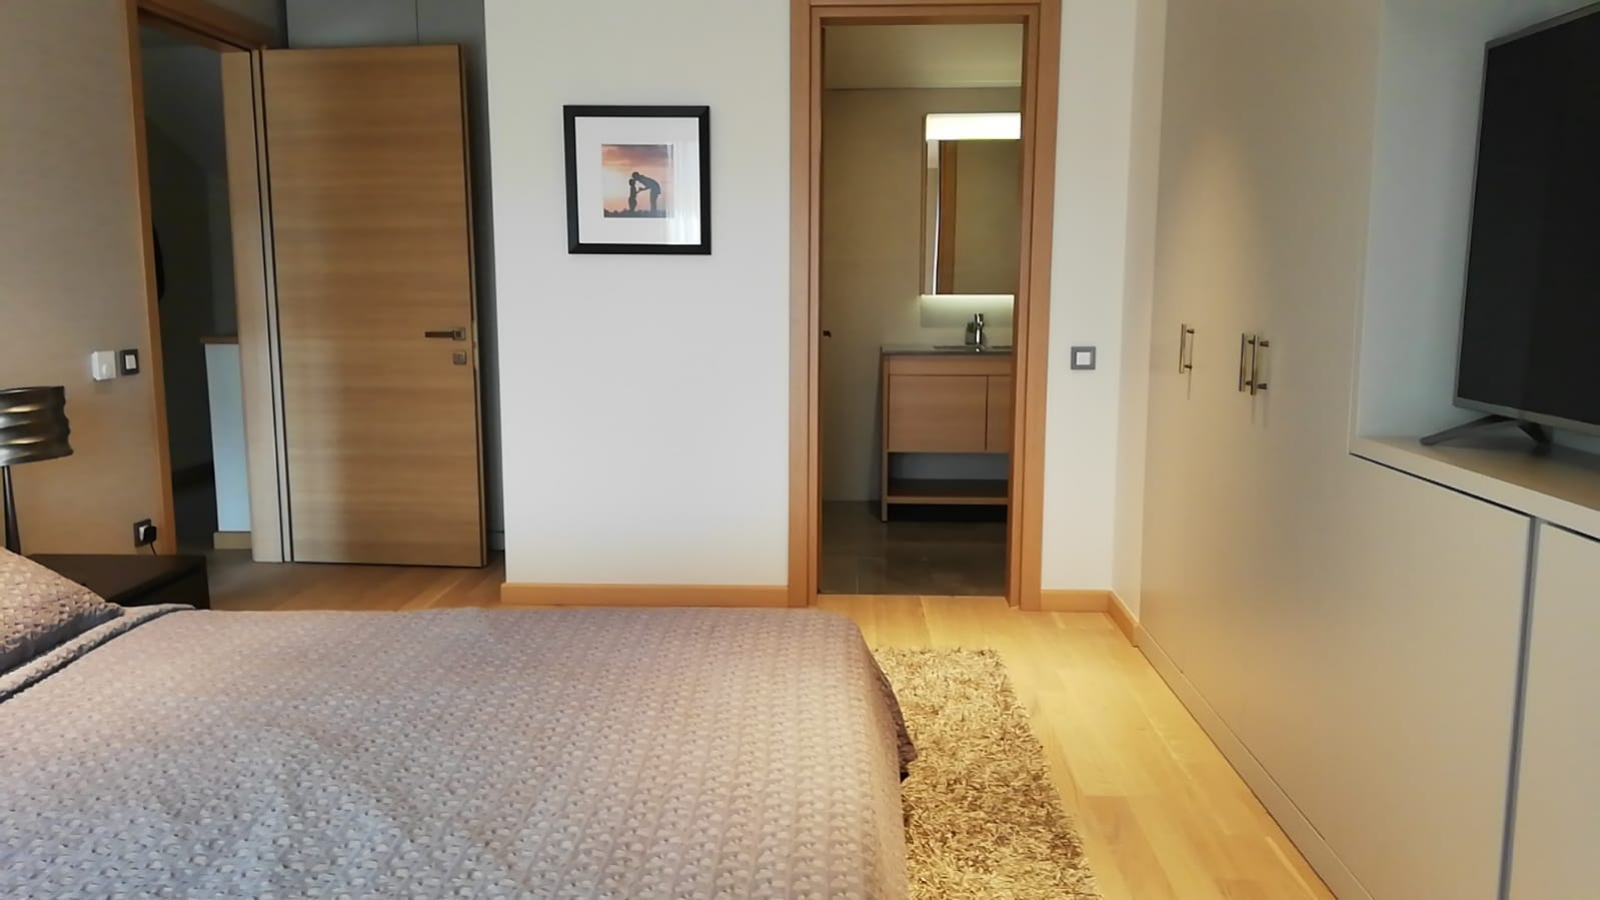 ZEKERİYAKÖY KÖY  RESIDENCE  3 + 1 191 m²